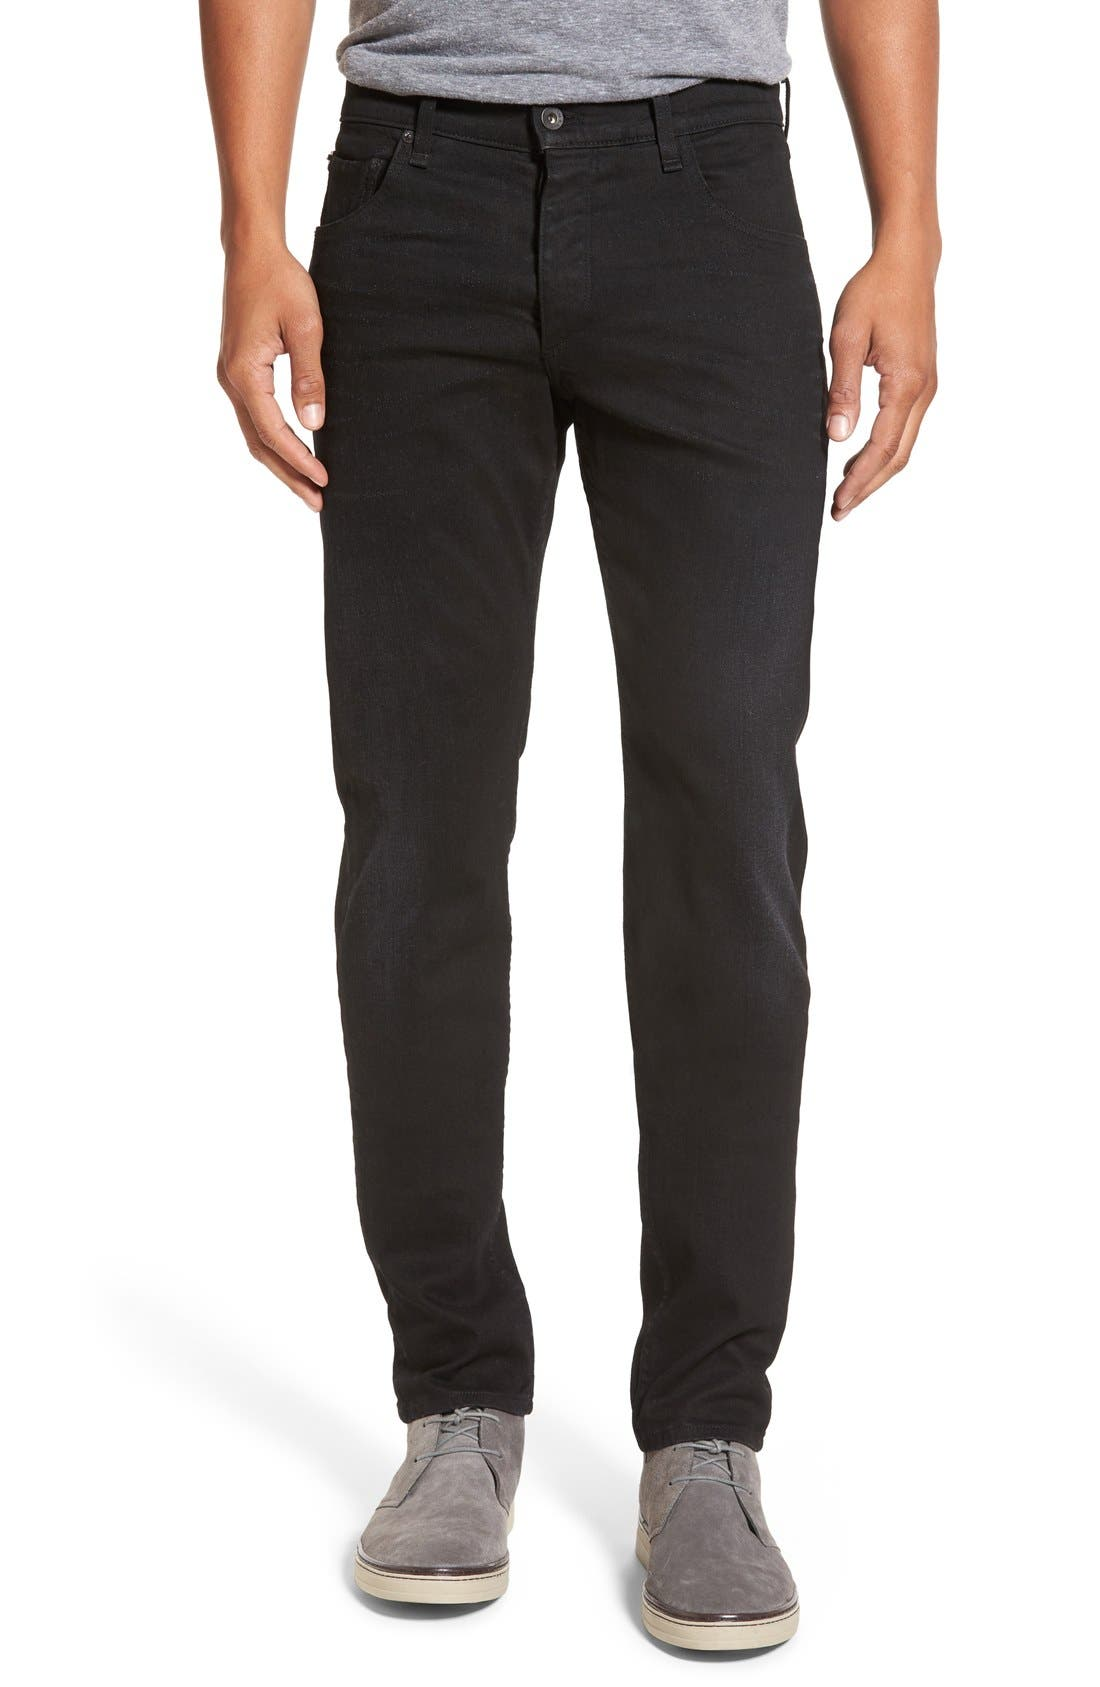 Main Image - rag & bone Standard Issue 'Fit 2' Slim Fit Jeans (Worn Black)